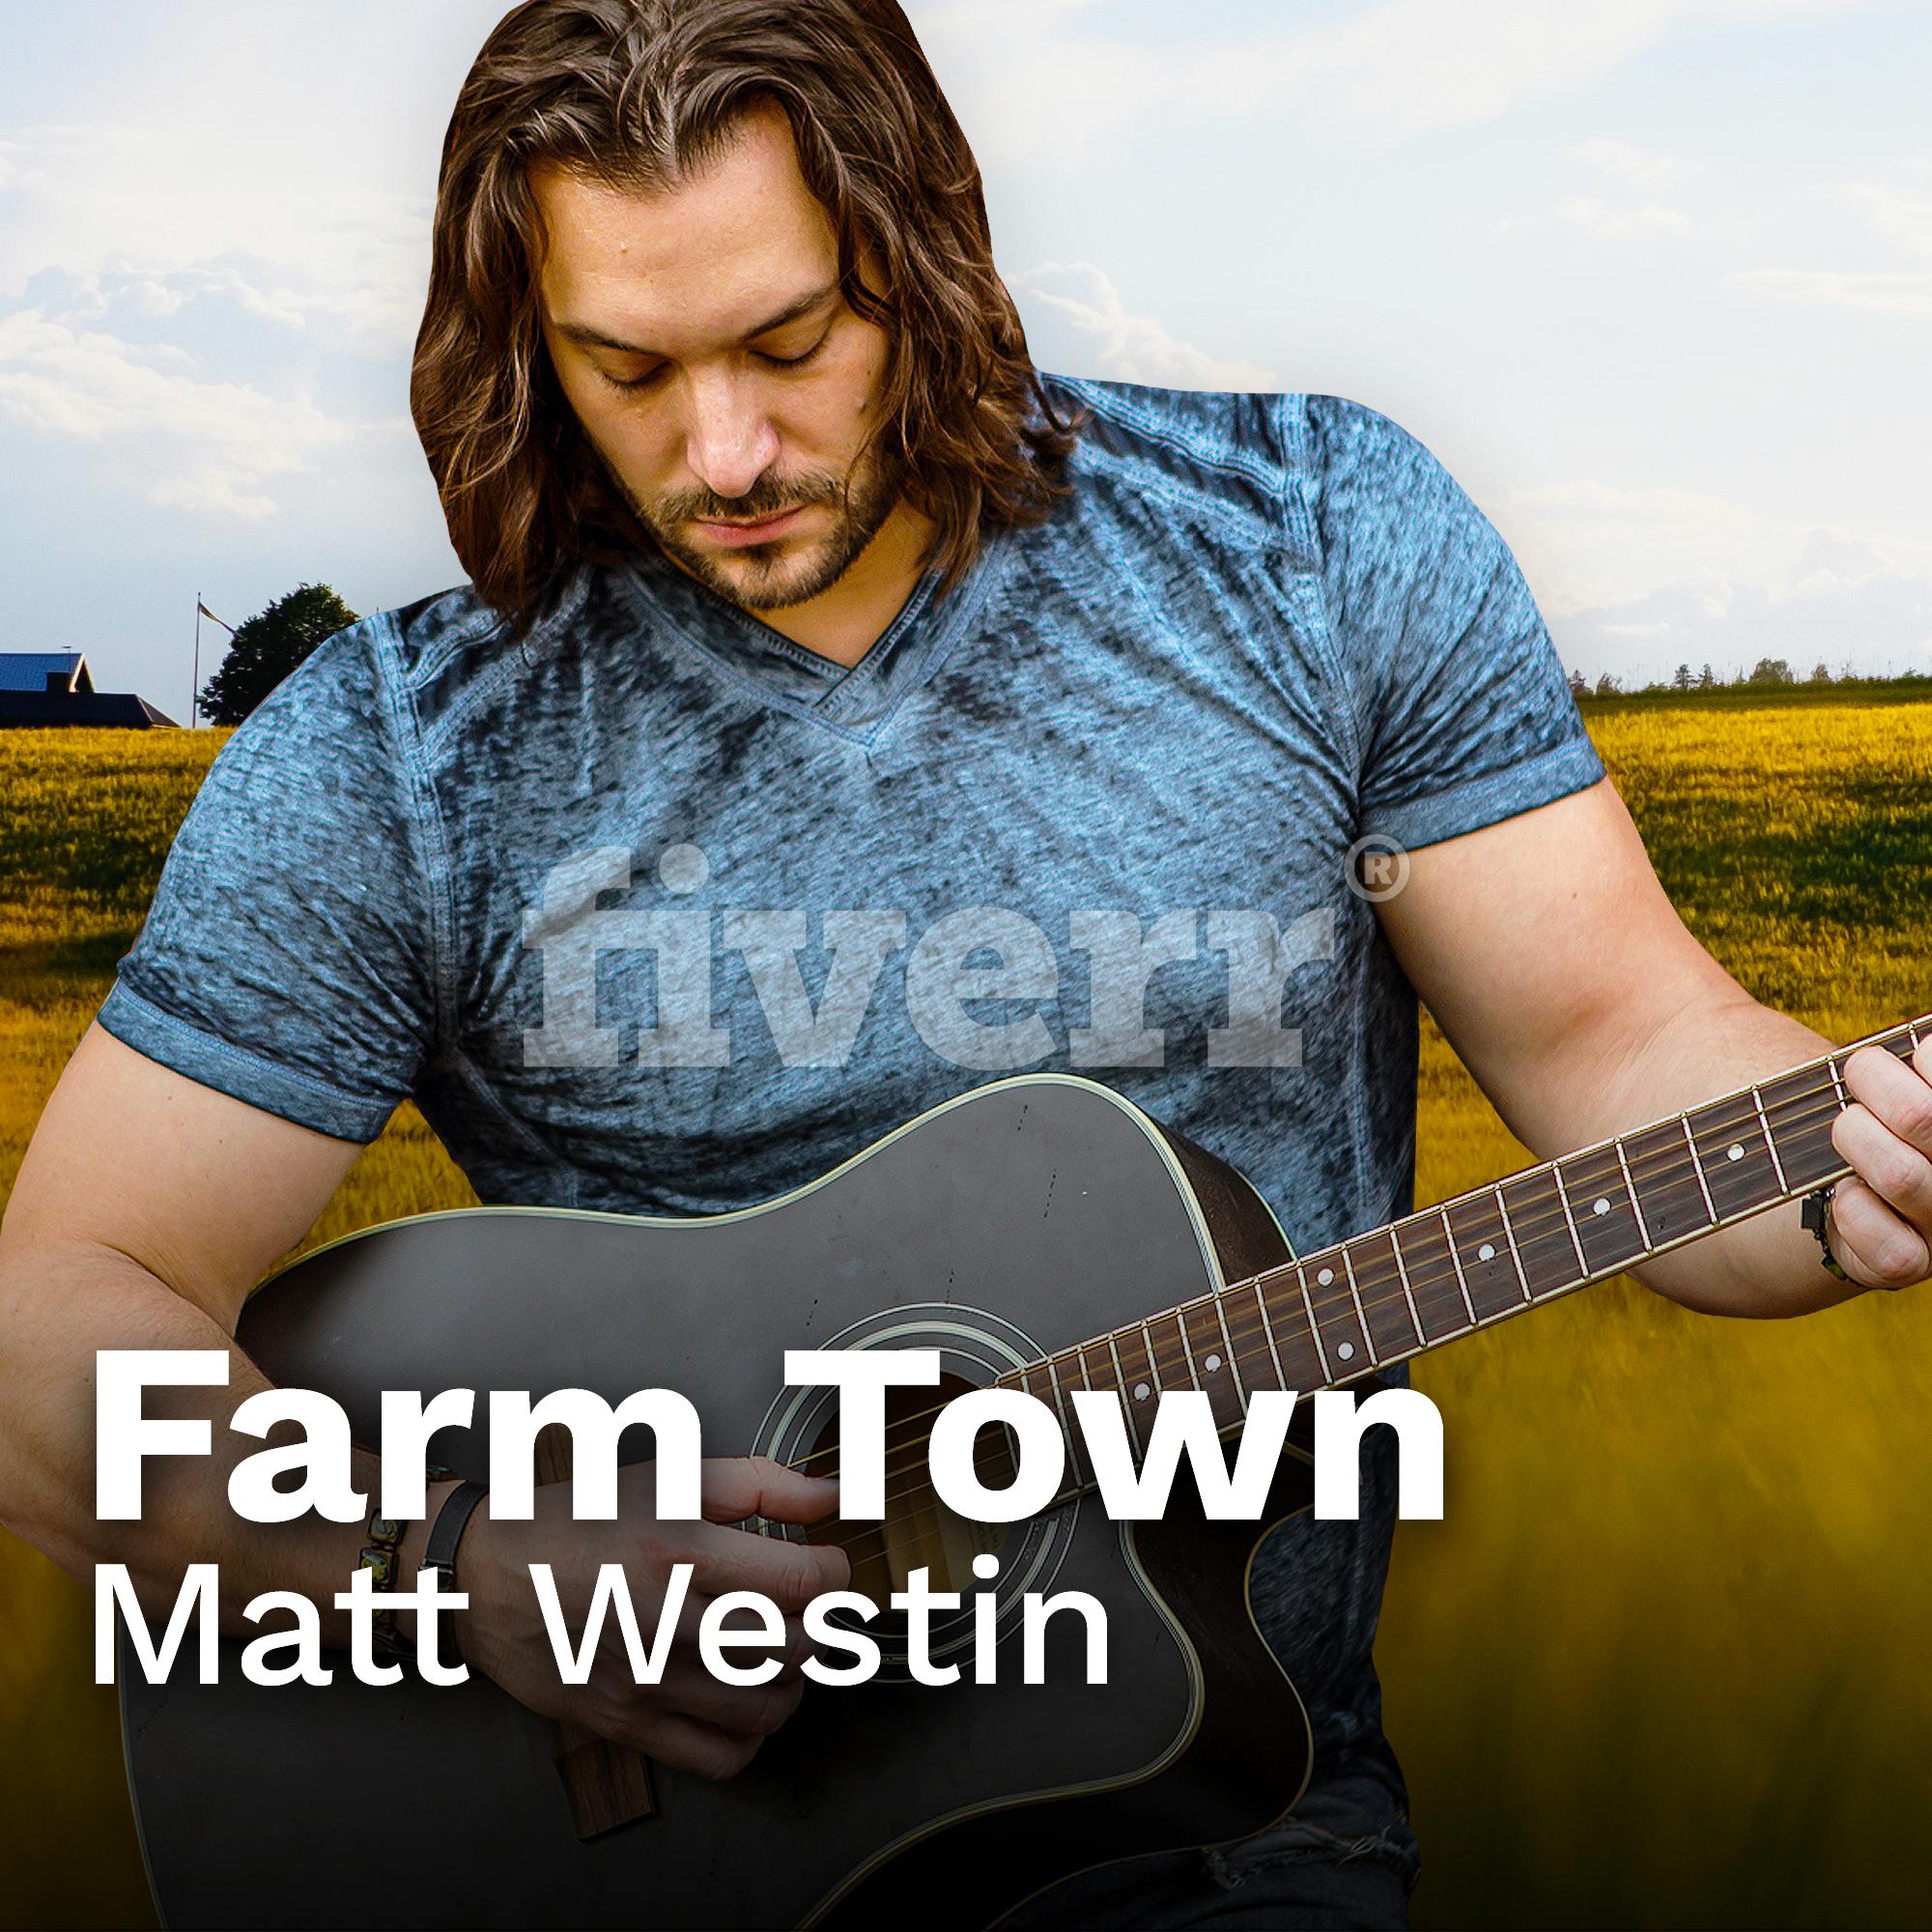 Matt Westin